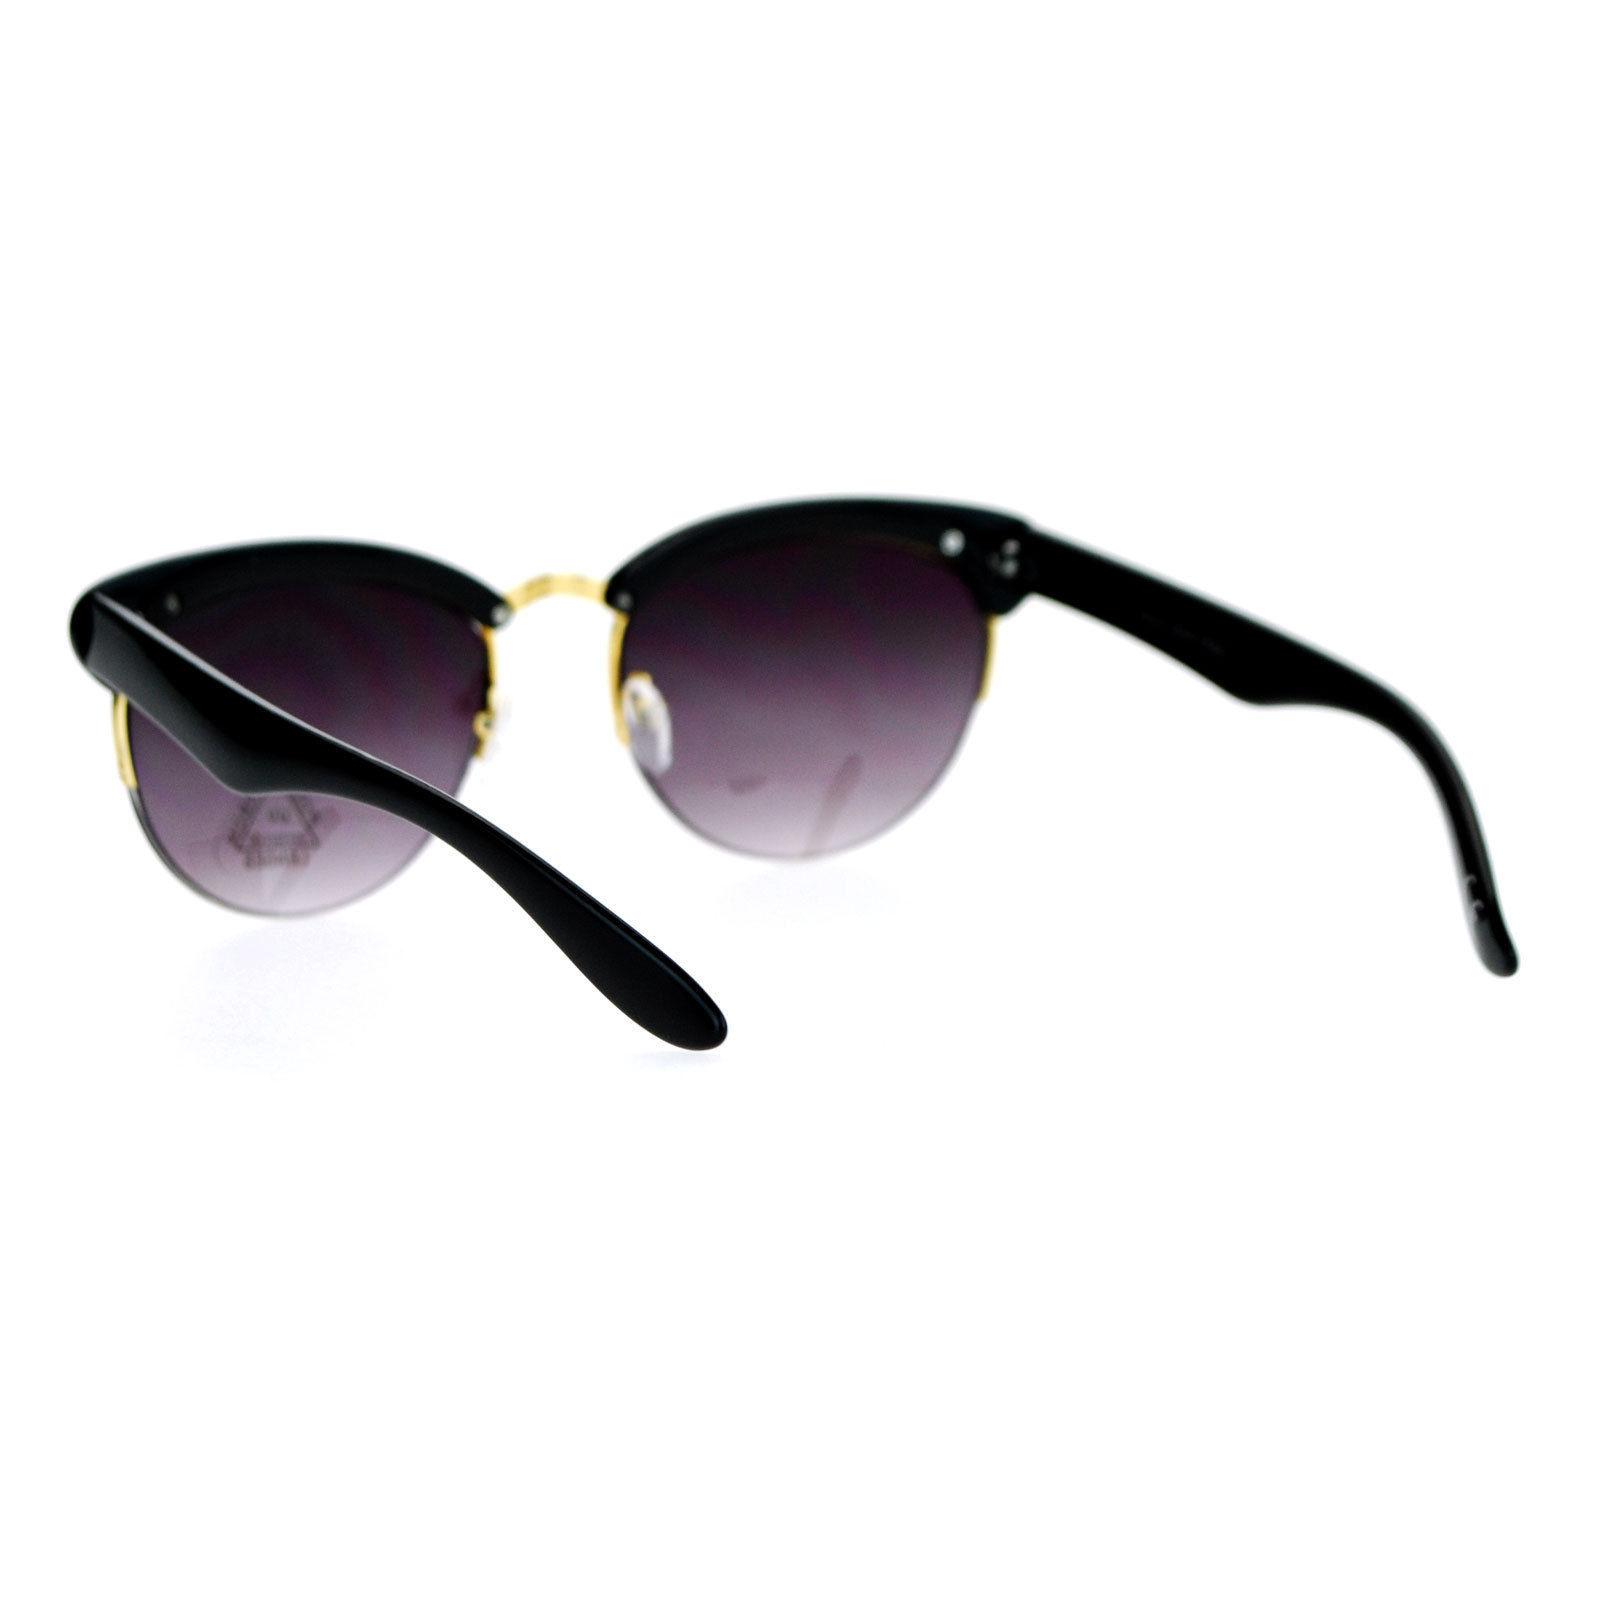 Womens Half Rim Sunglasses Round Cateye Top Fashion Eyewear